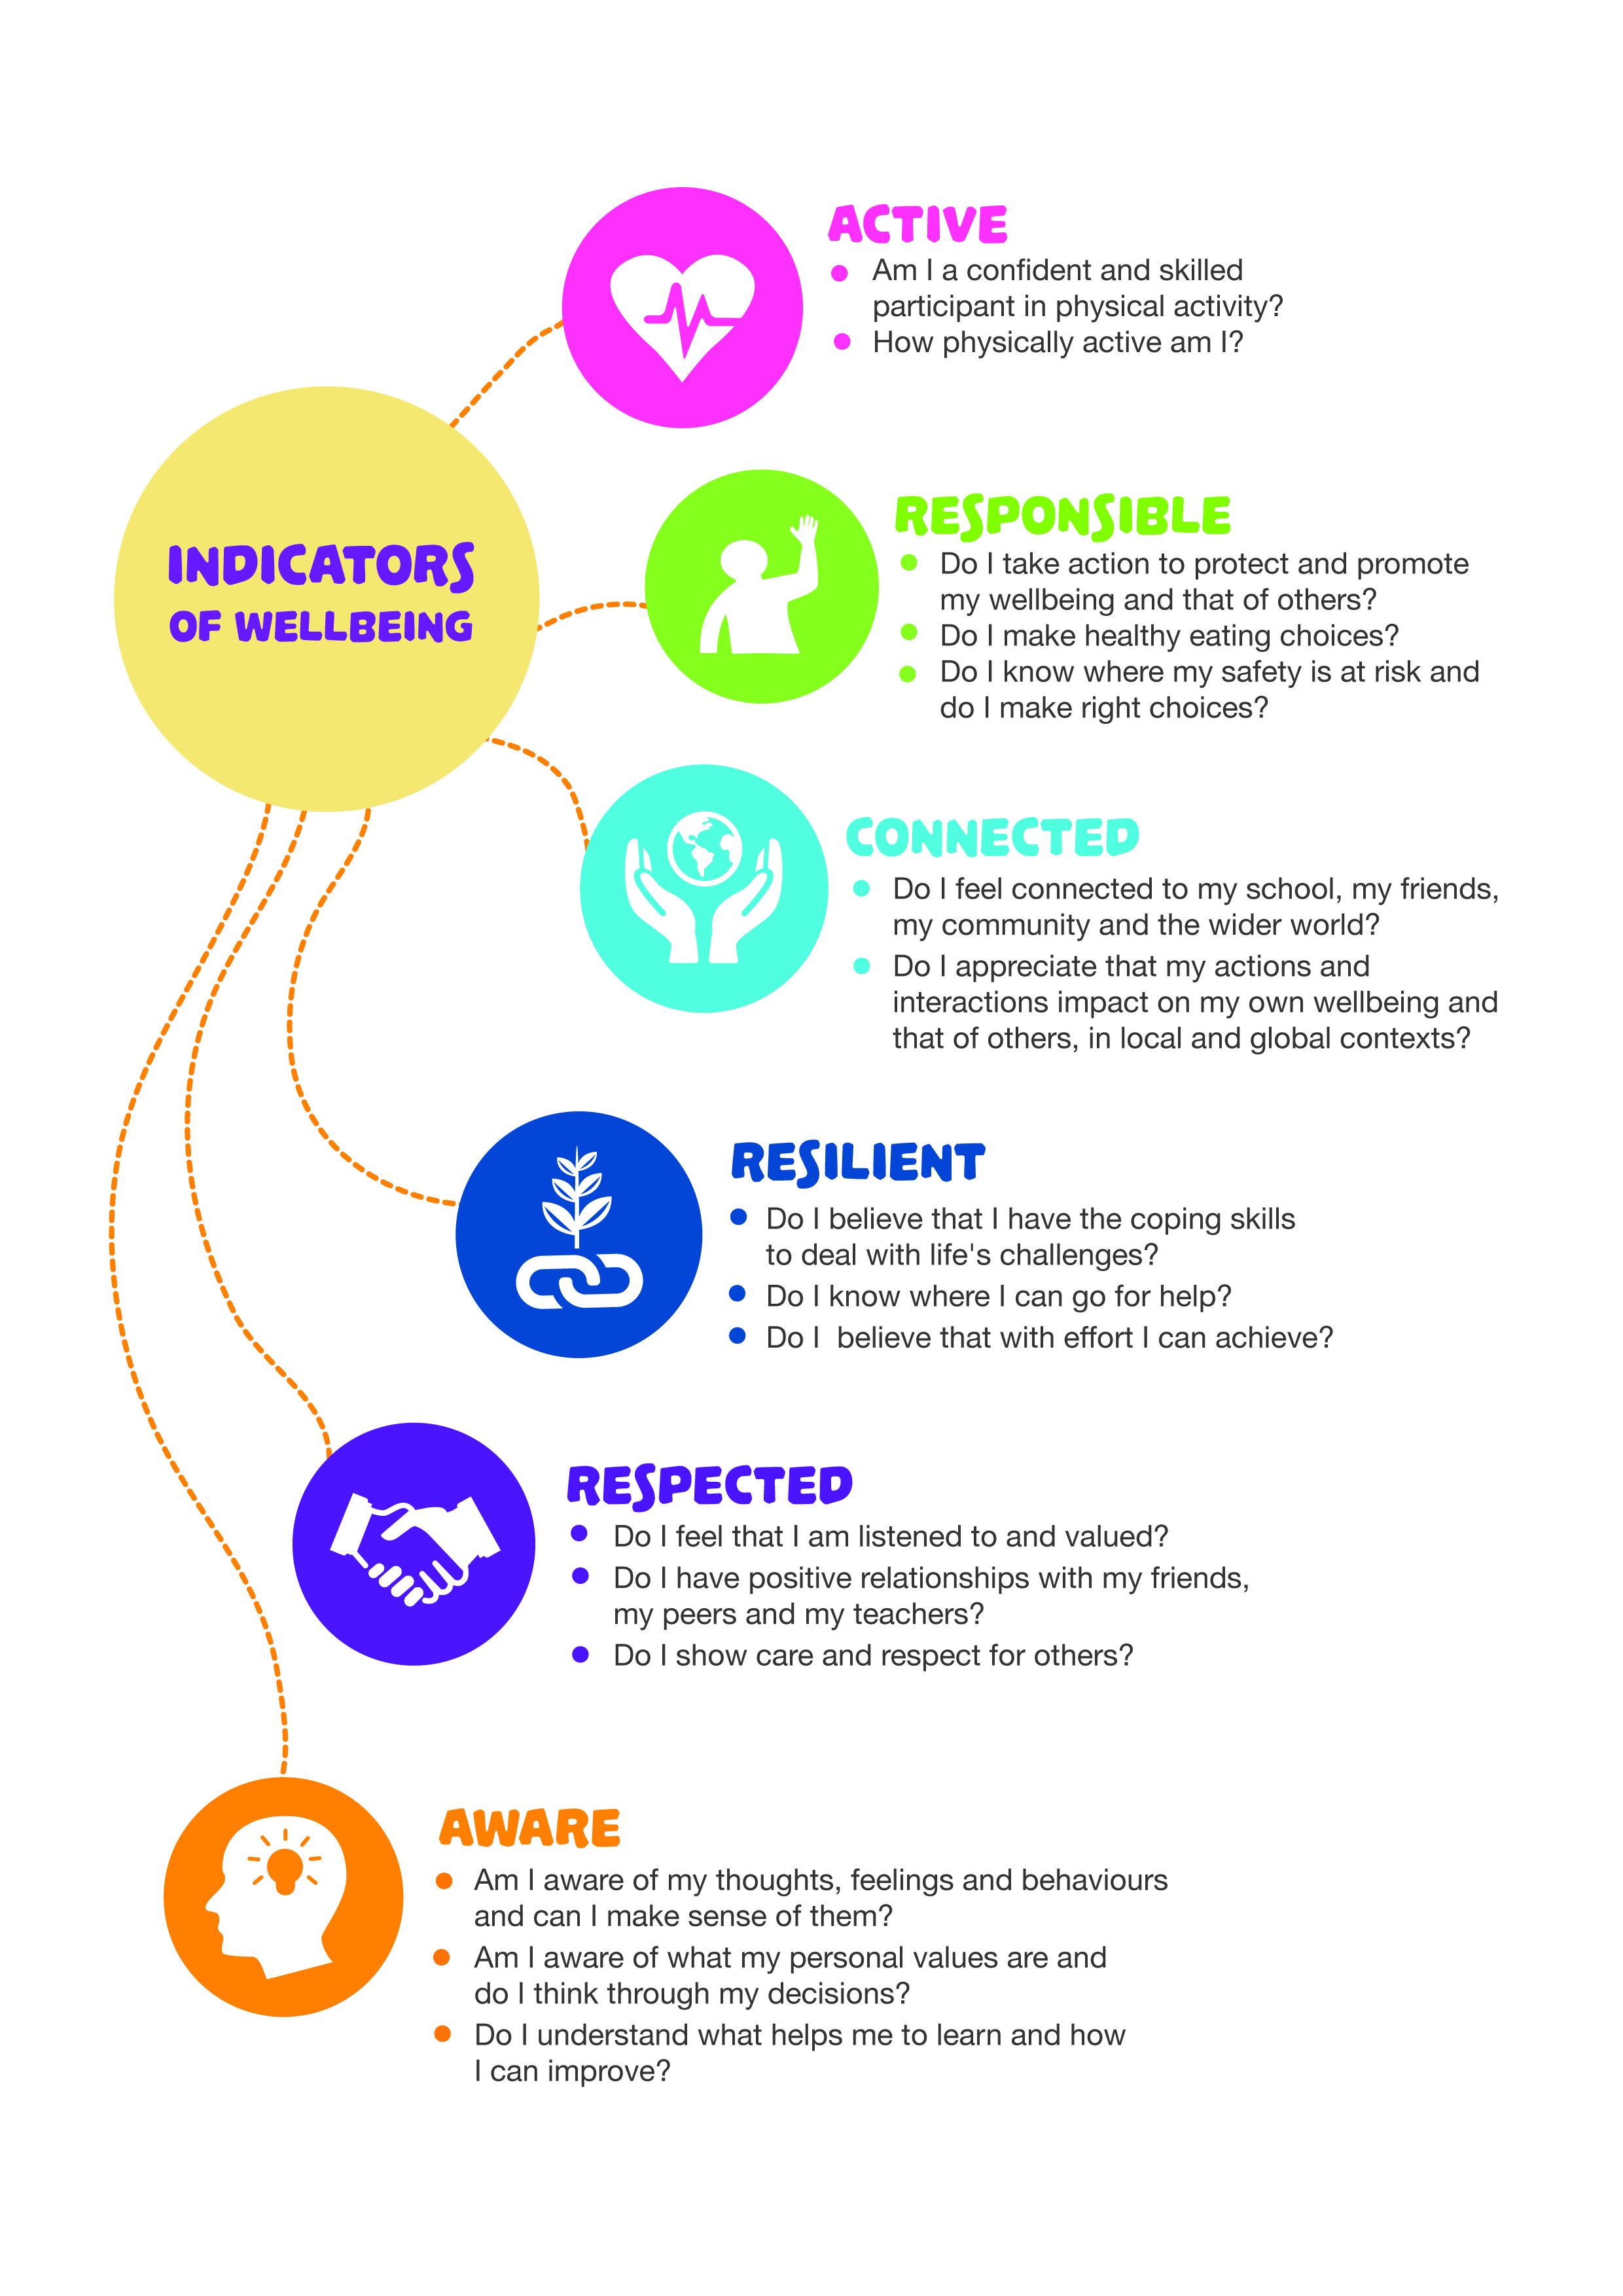 nccaindicators-of-wellbeing.jpg